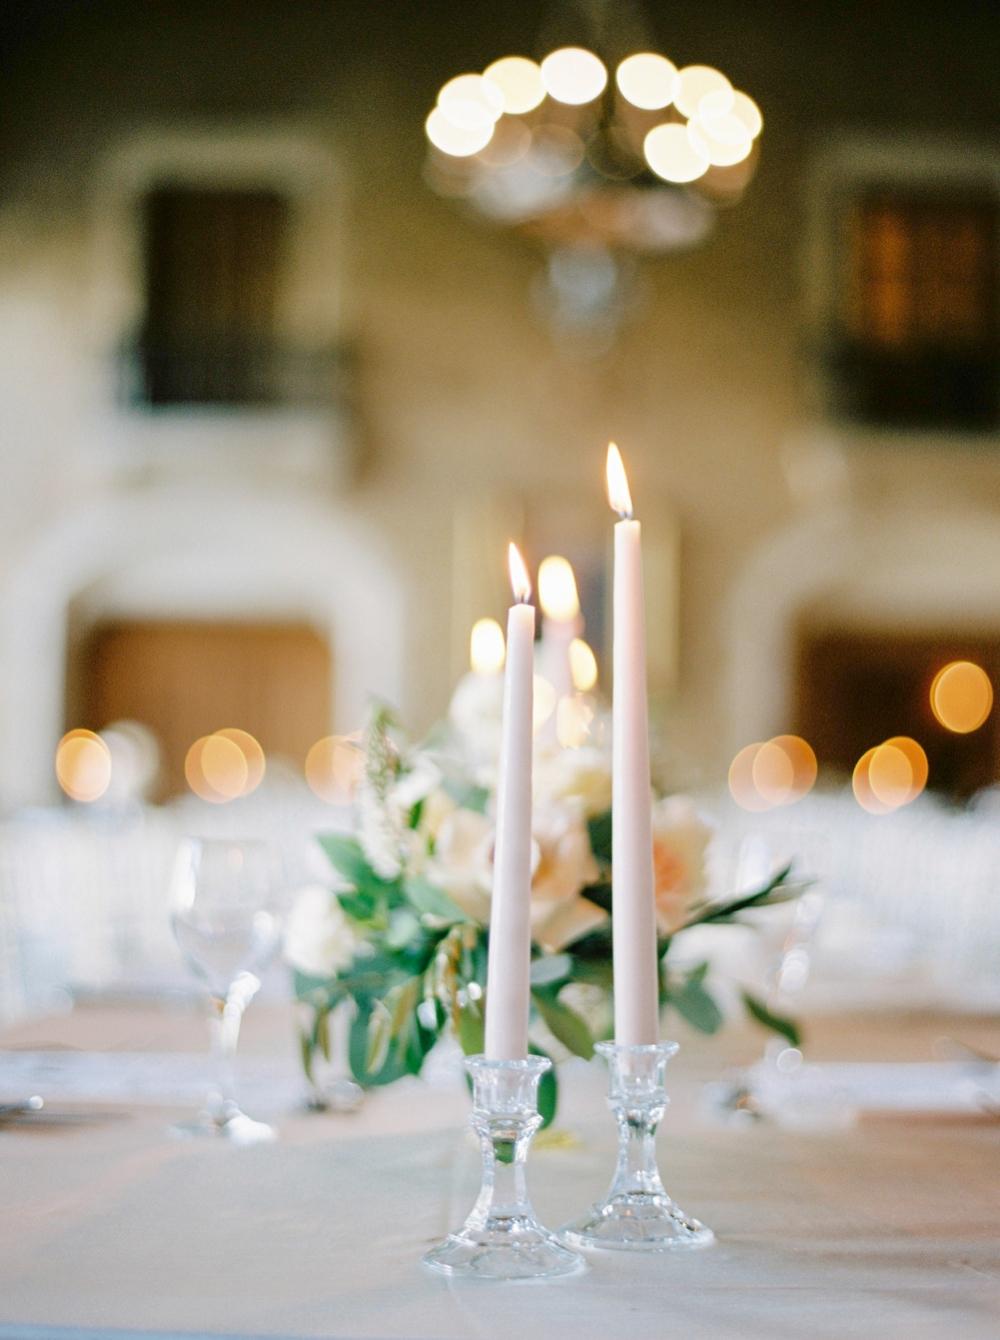 sandstone taper candles | mount stephen hall wedding reception | fairmont banff springs hotel wedding ceremony canadian rocky mountains | banff wedding photographers